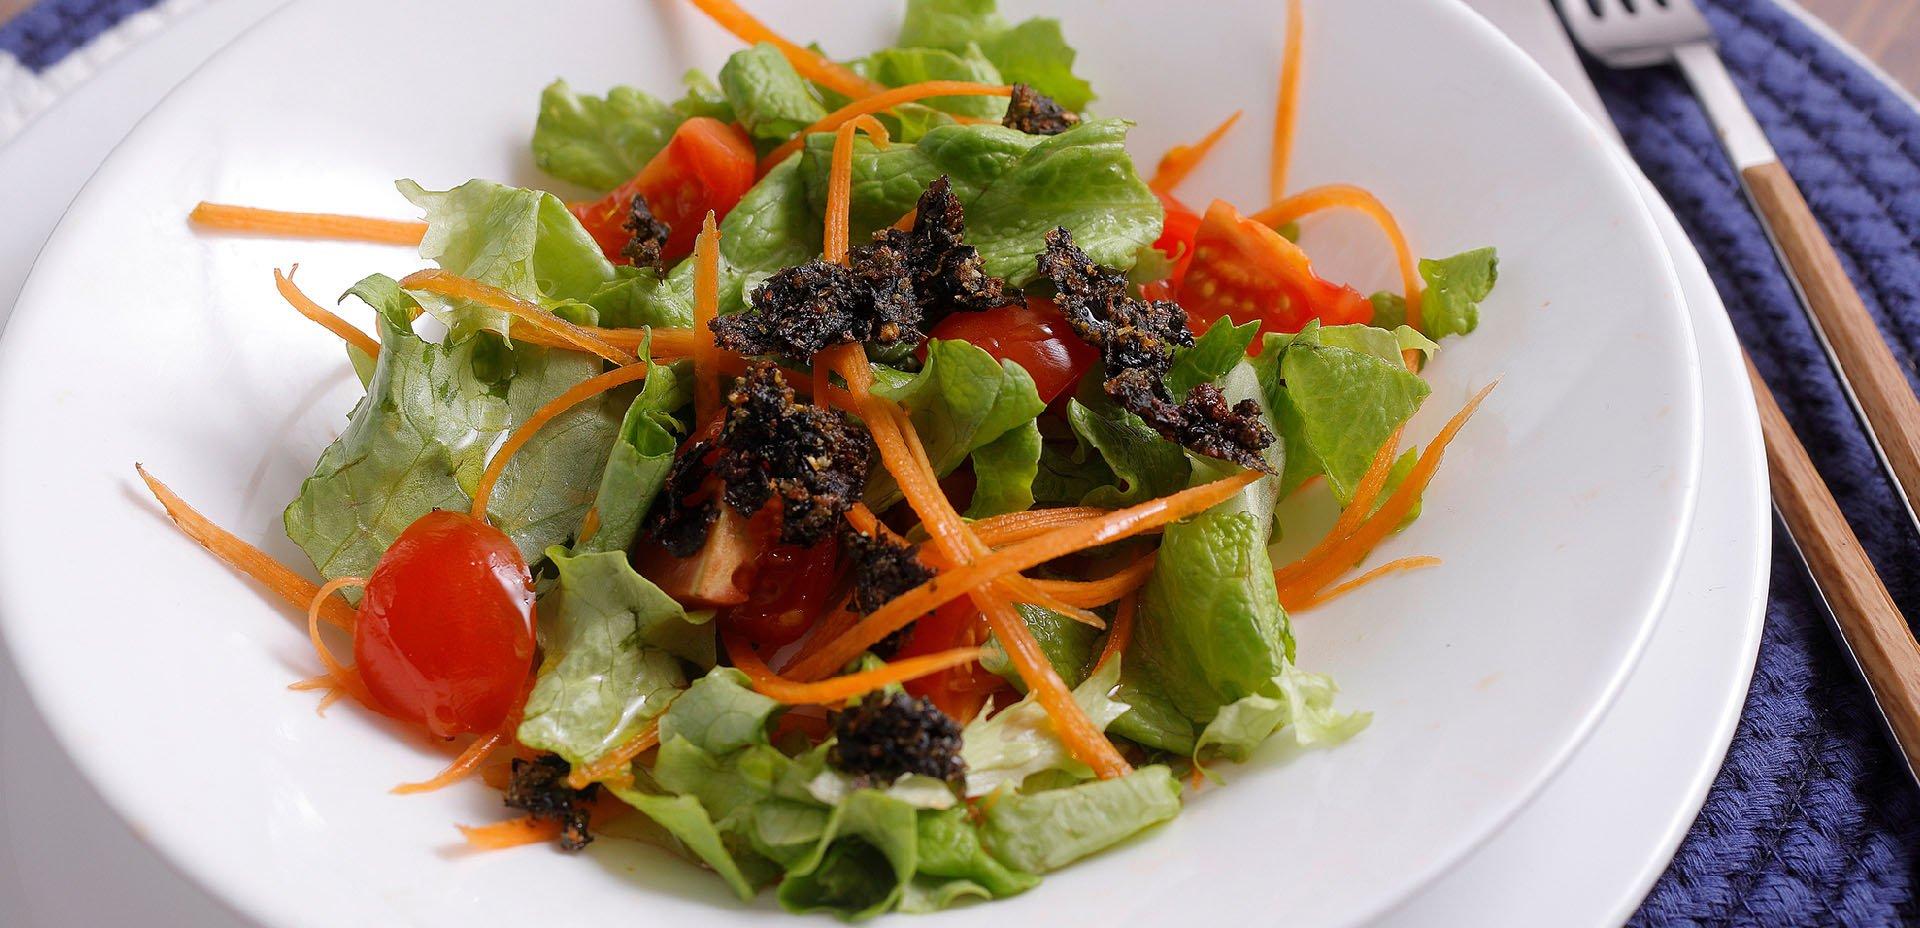 insalata e alghe